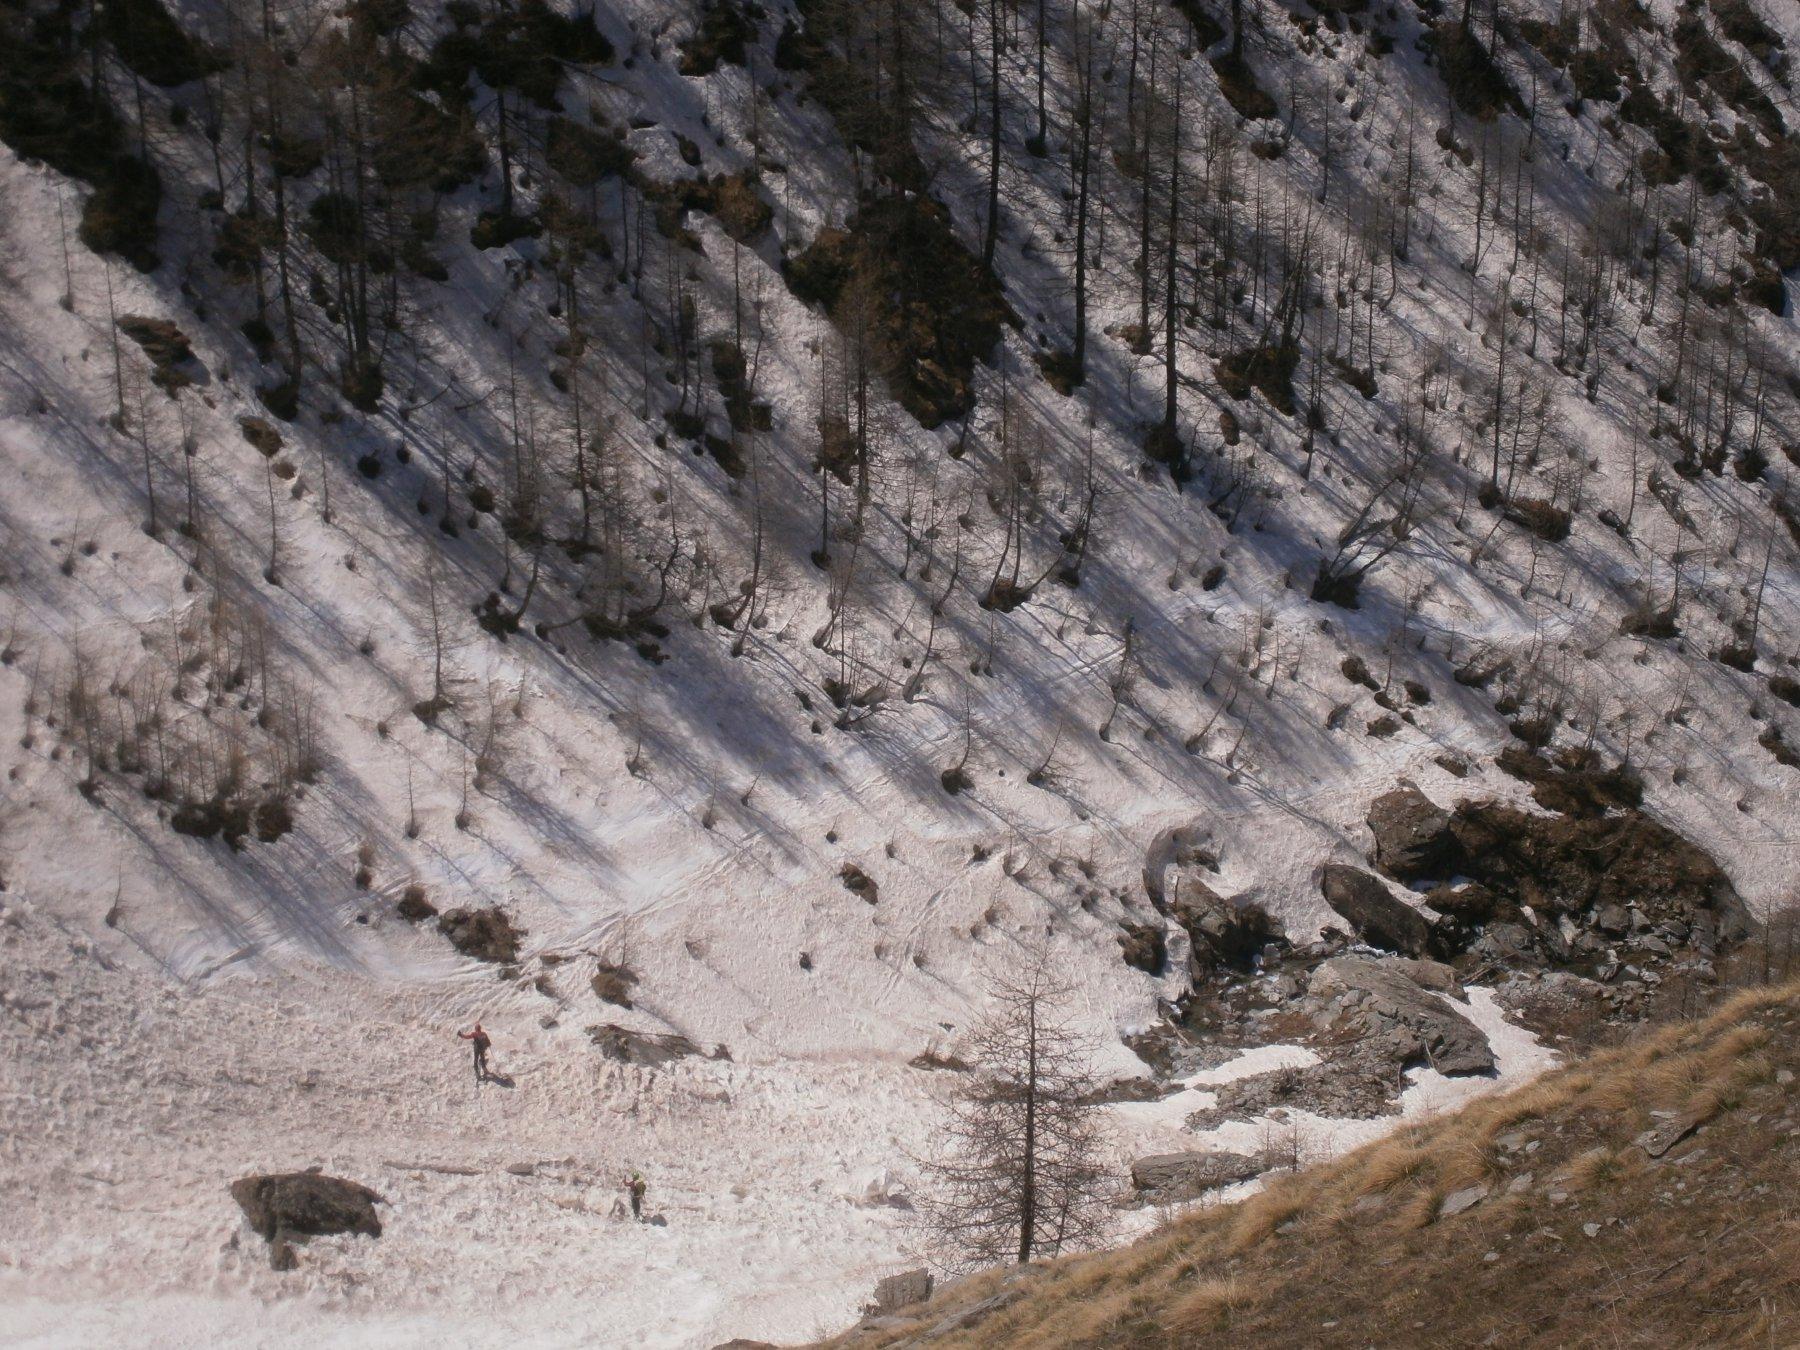 Gorgia vista dal sentiero estivo